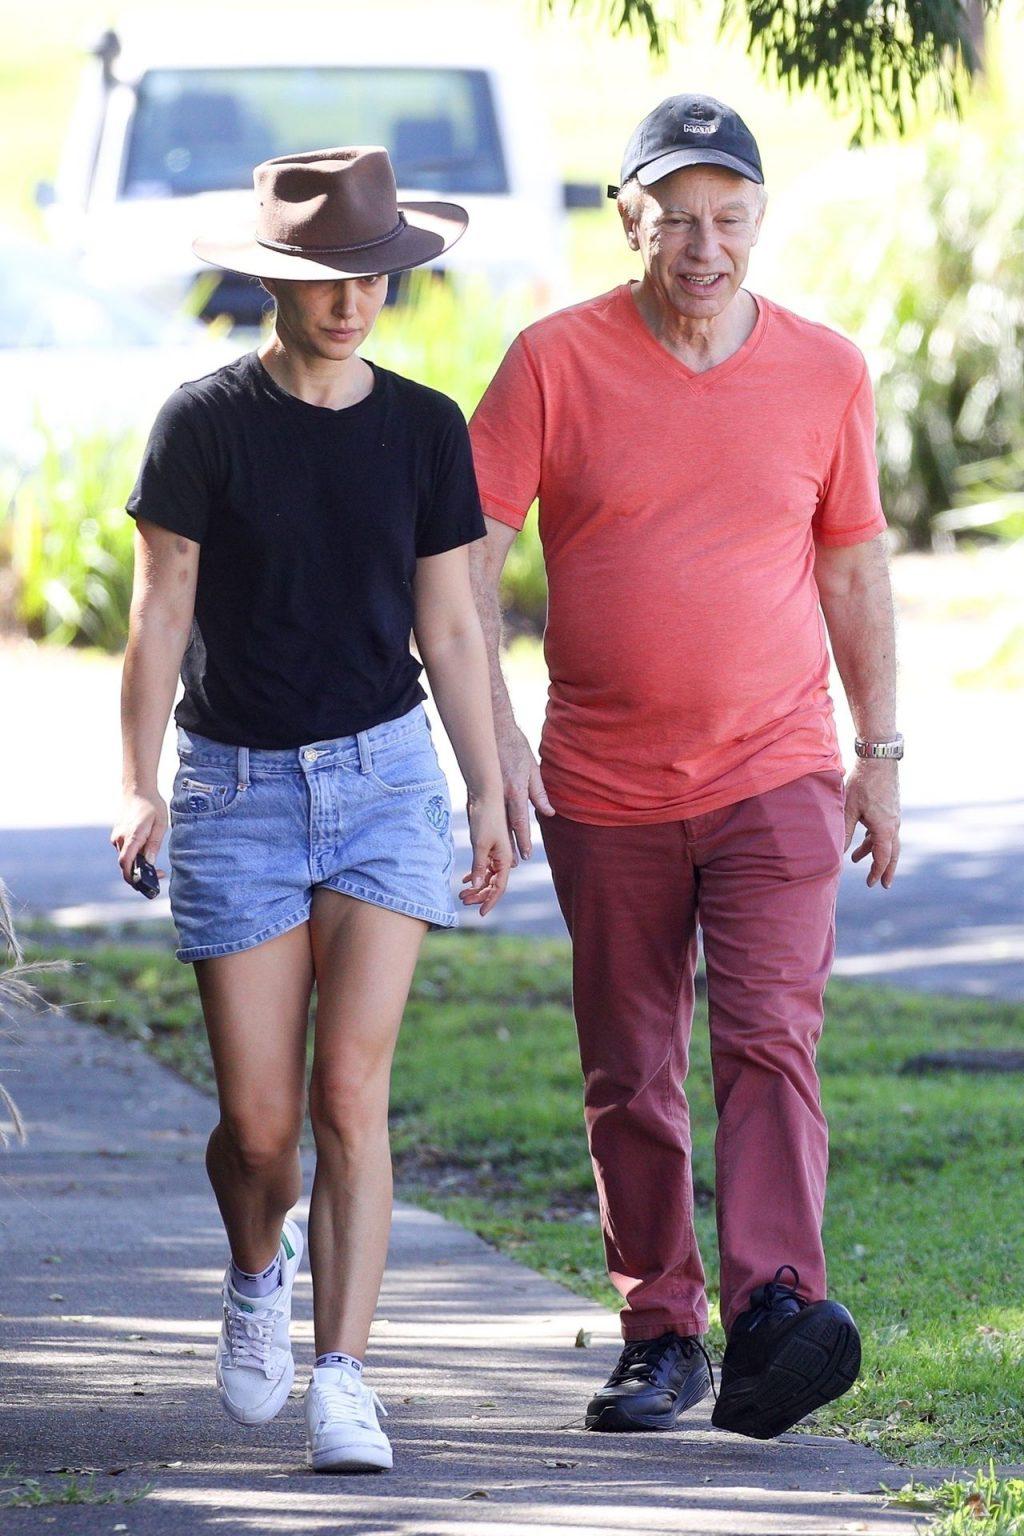 Braless Natalie Portman is Pictured Enjoying Breakfast with Her Parents in Sydney (56 Photos)